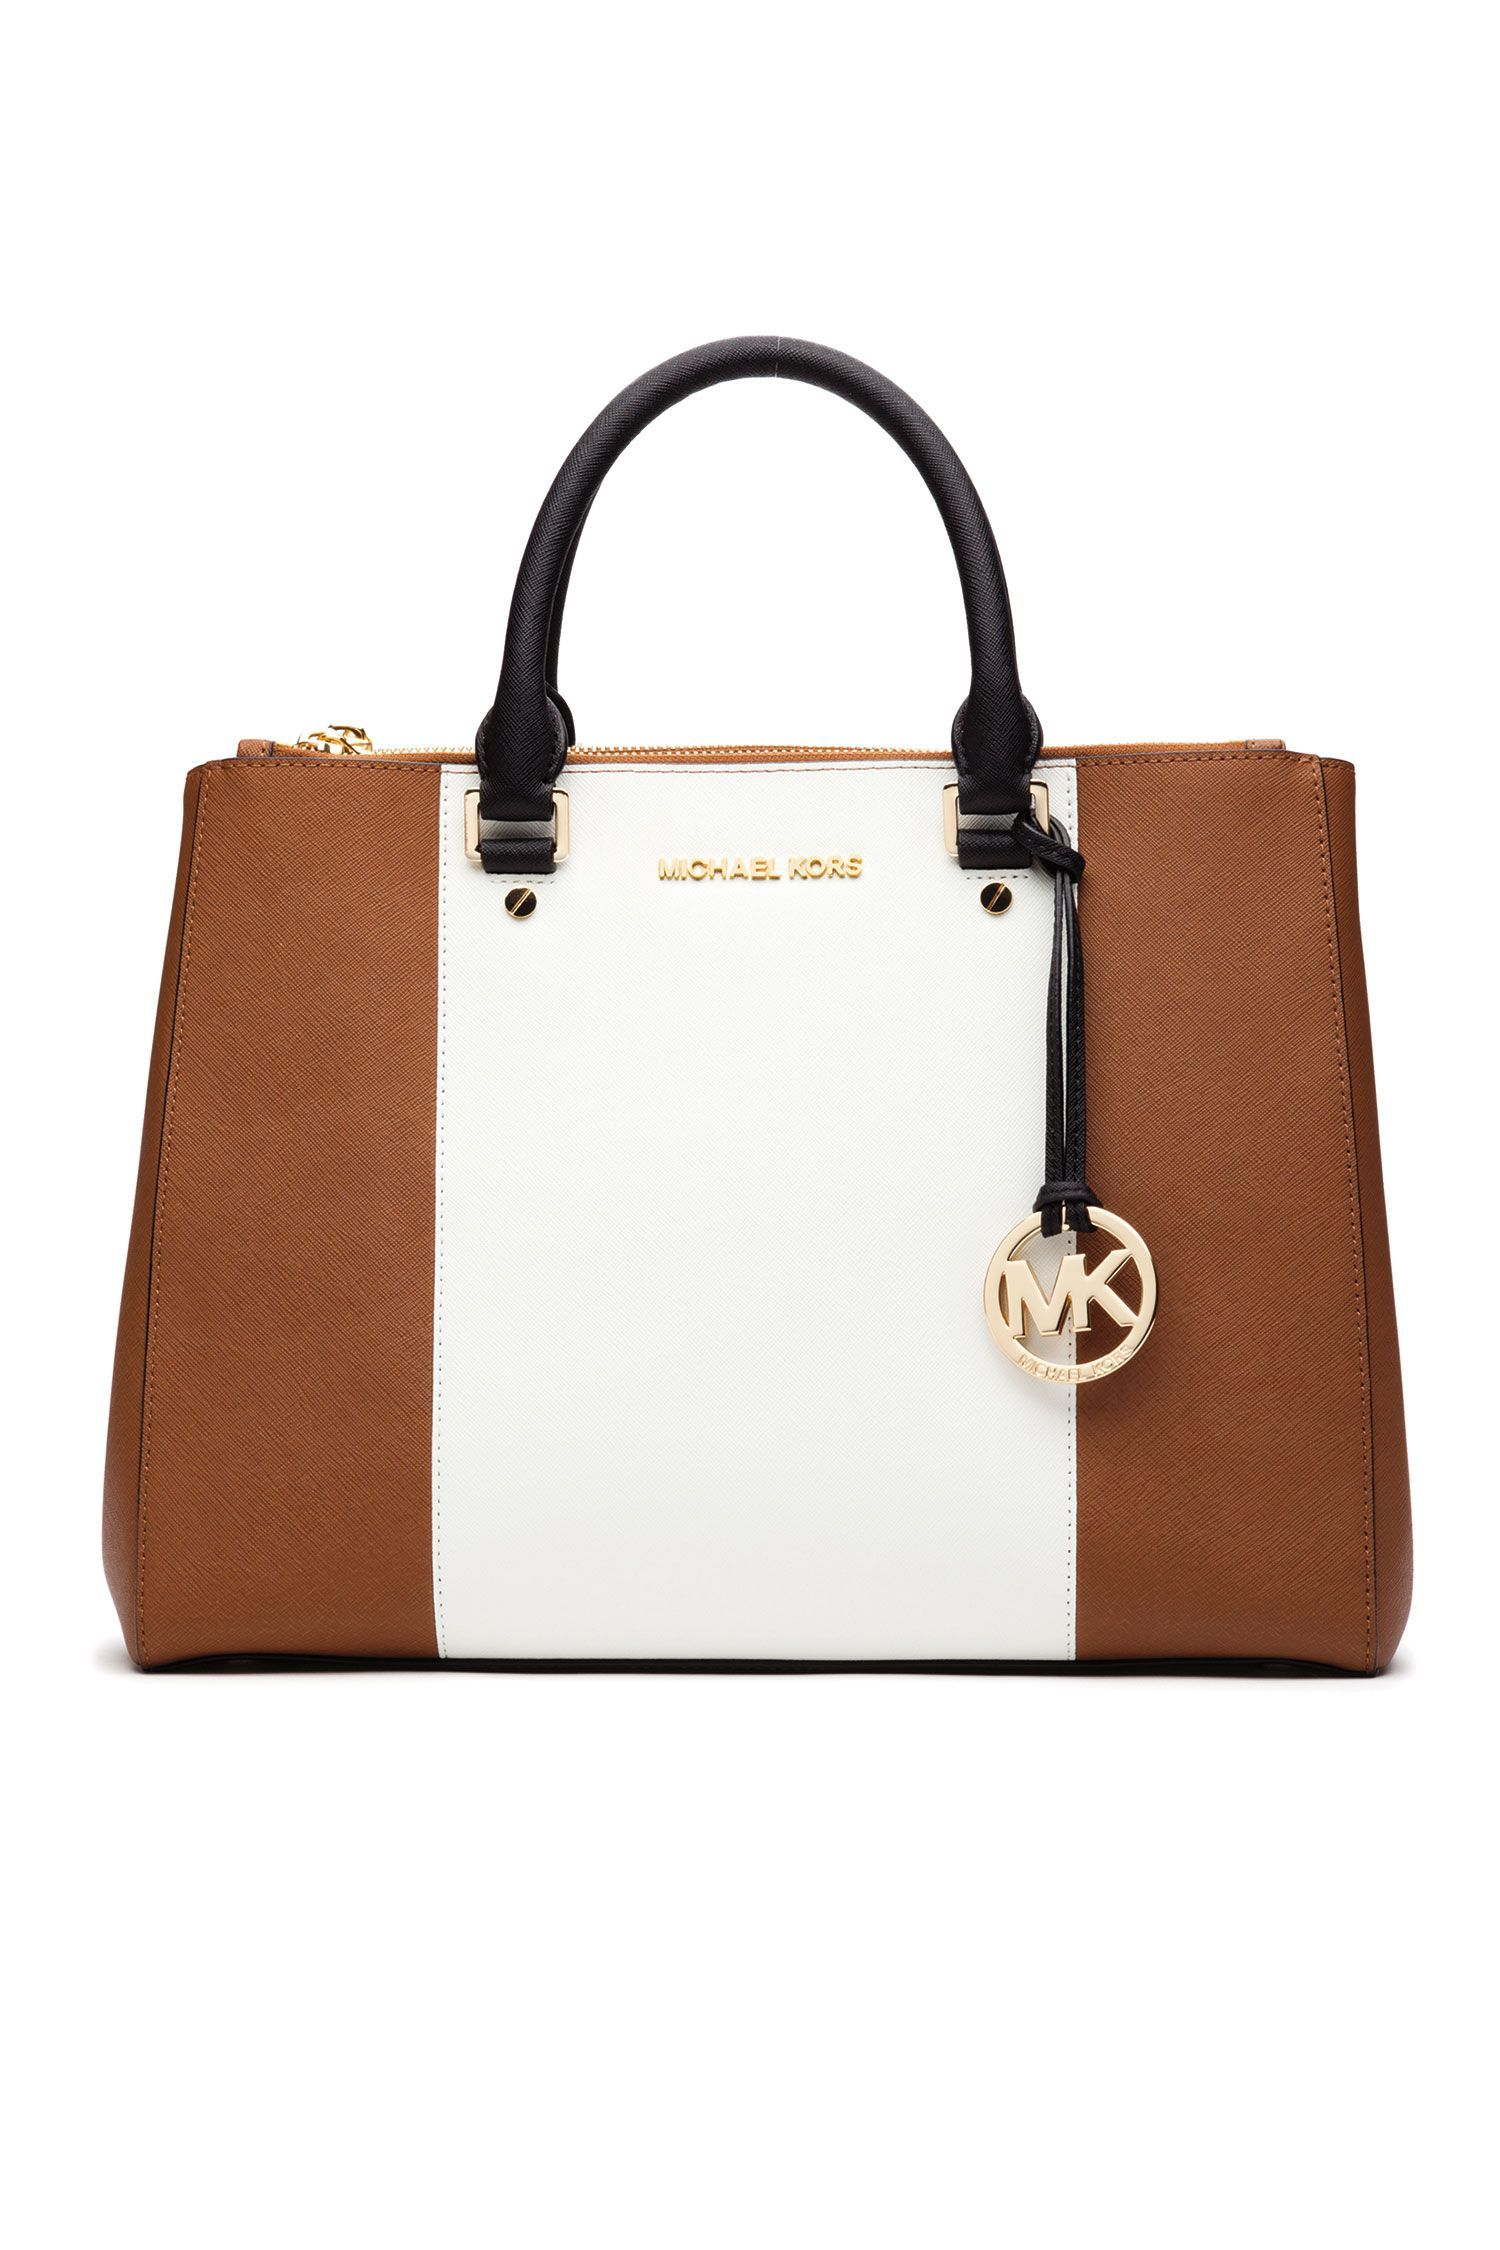 12 Perfectly Chic Work Bags Harpersbazaar